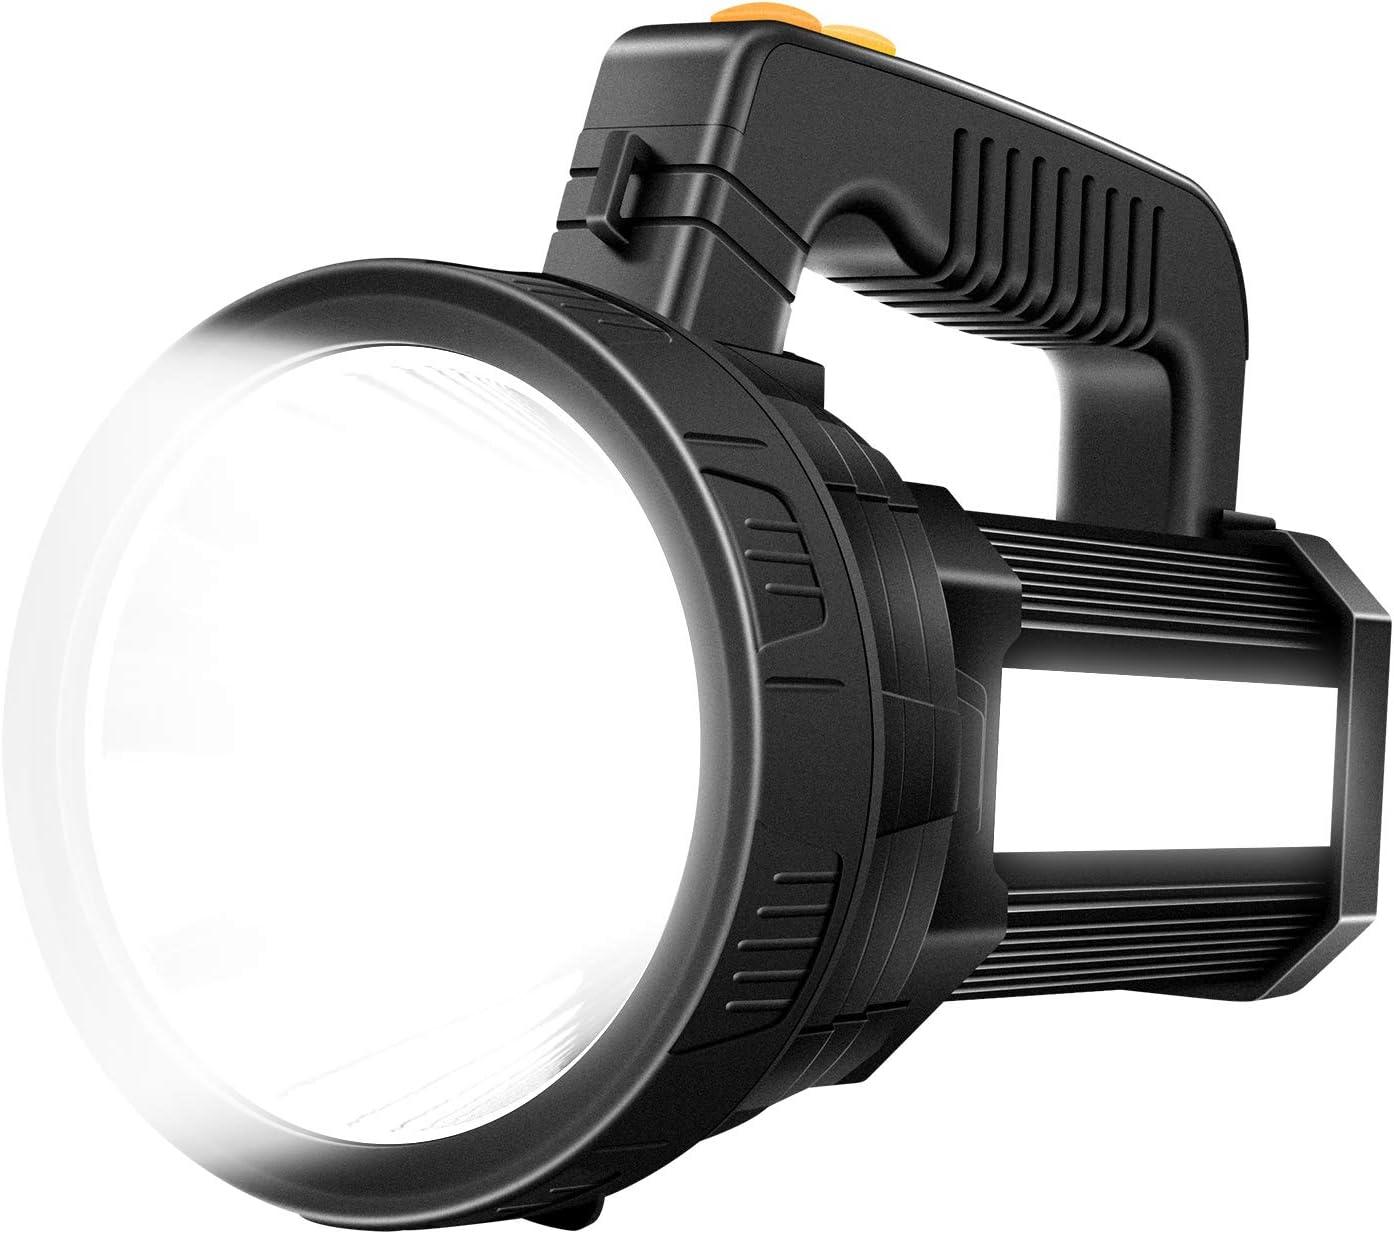 3 Modos Bater/ía 3x AAA no incl. Autonom/ía hasta 14h Clip para cintur/ón Alcance 180 m Zoom giratorio Resiste inmersi/ón temporal hasta 1 m Linterna LED de aluminio anodizado 360 lm IP67